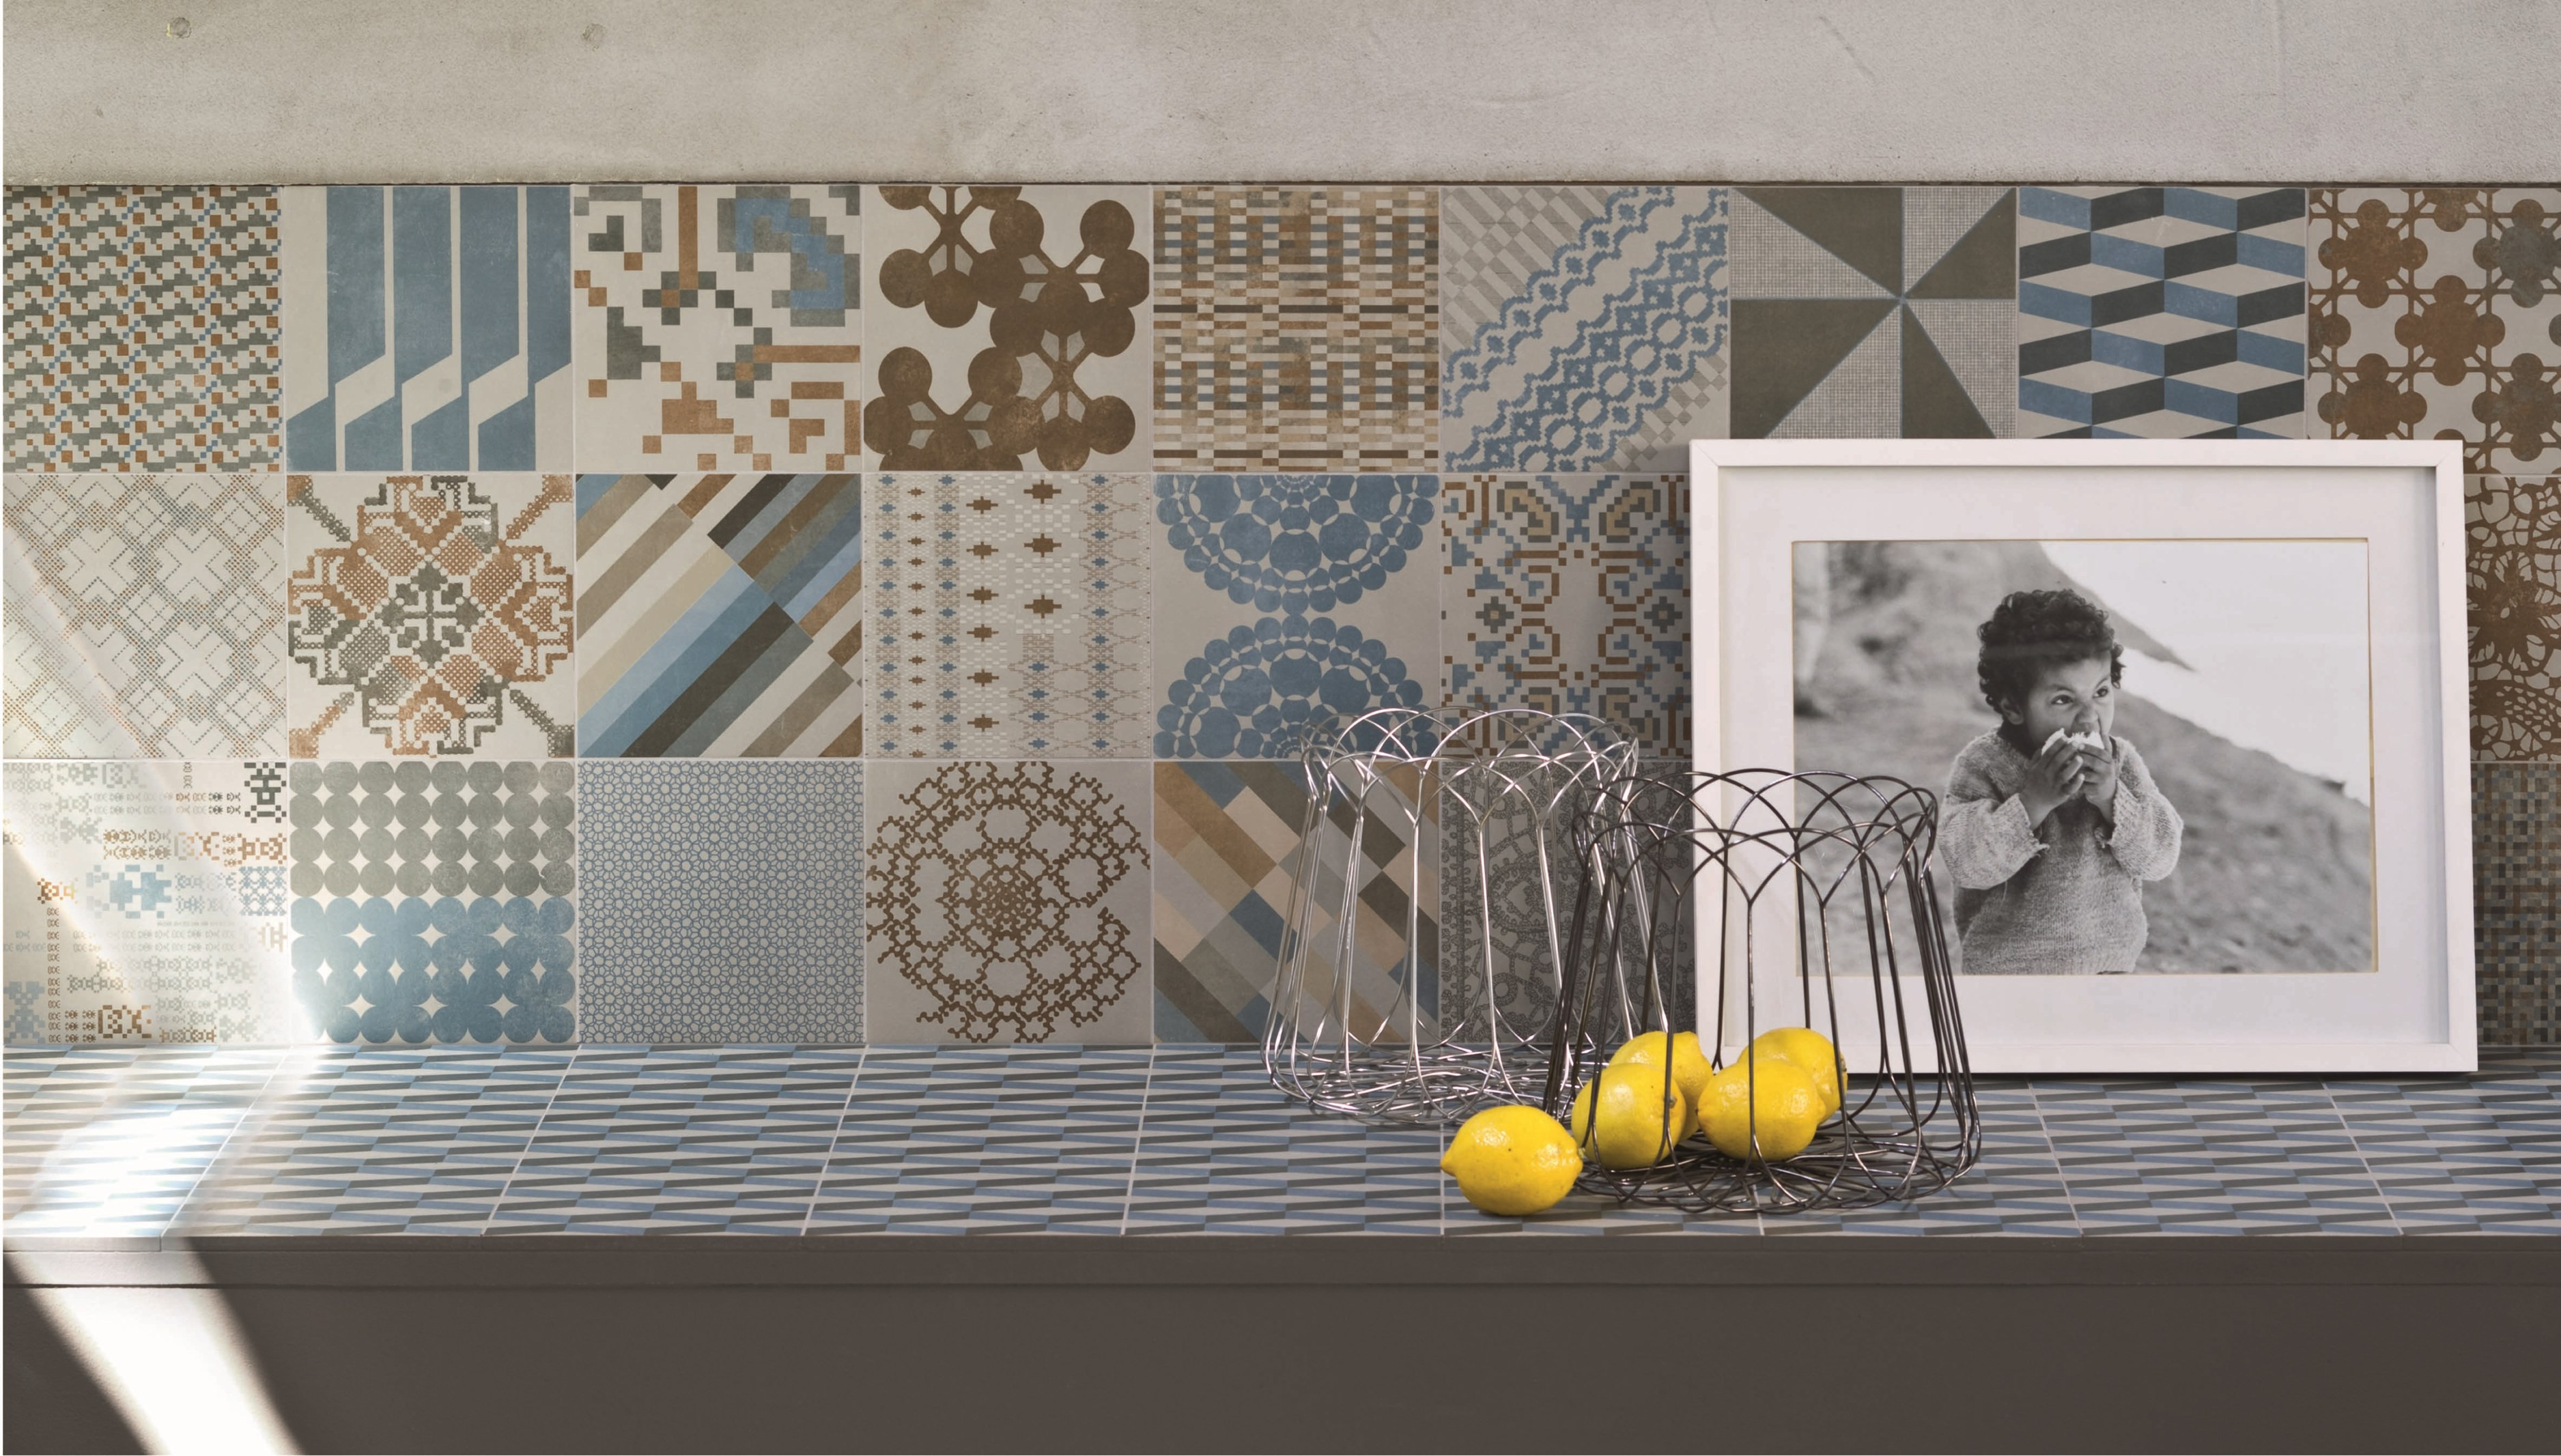 Pavimento Cucina Bianco E Nero : Cucina con pavimento bianco e ...